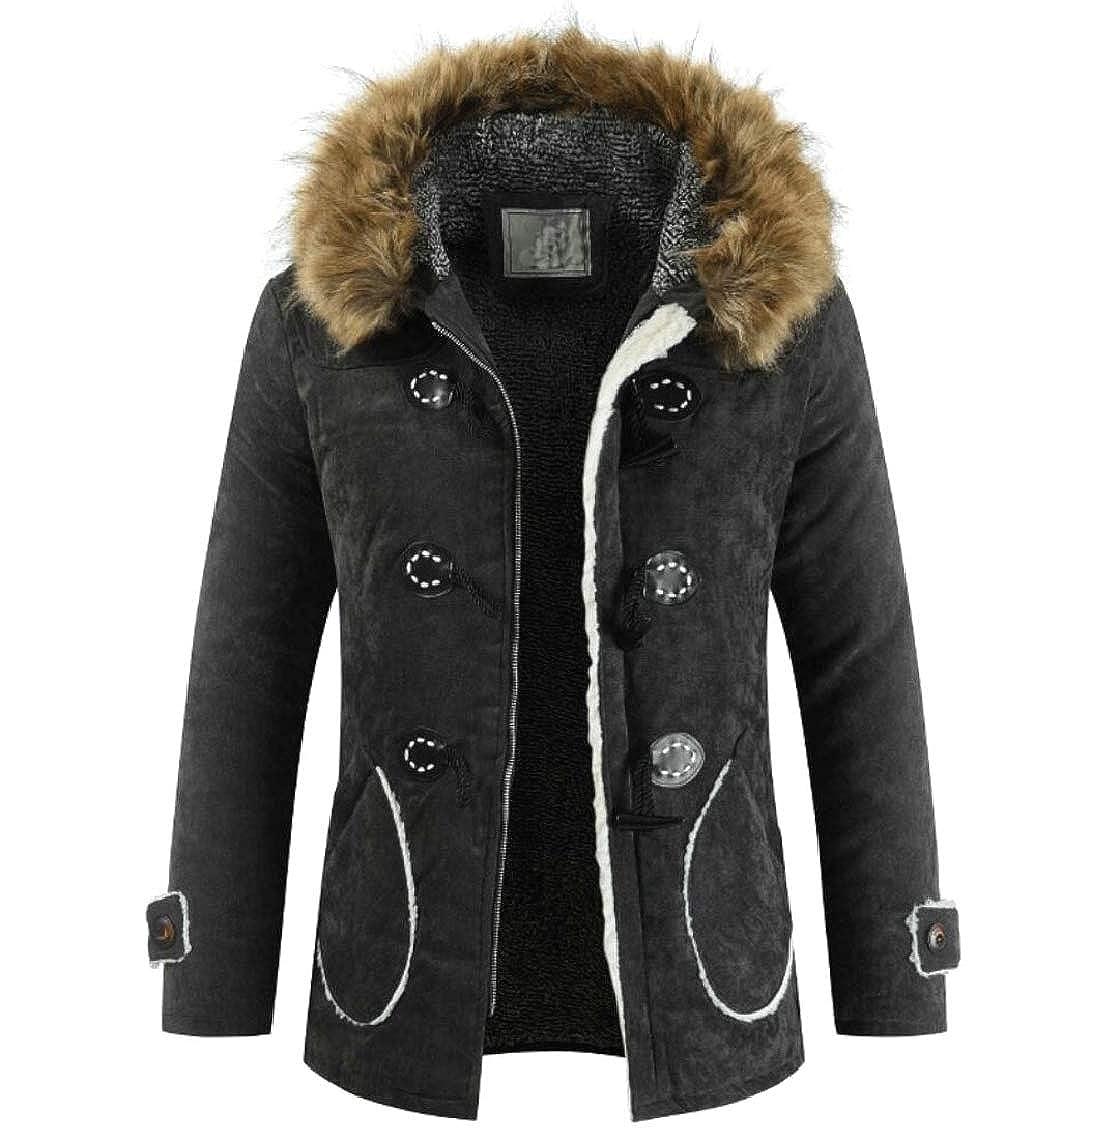 Jmwss QD Mens Thicken Faux-Fur Collar Hoodies Velvet Fleece Parka Jacket Coat